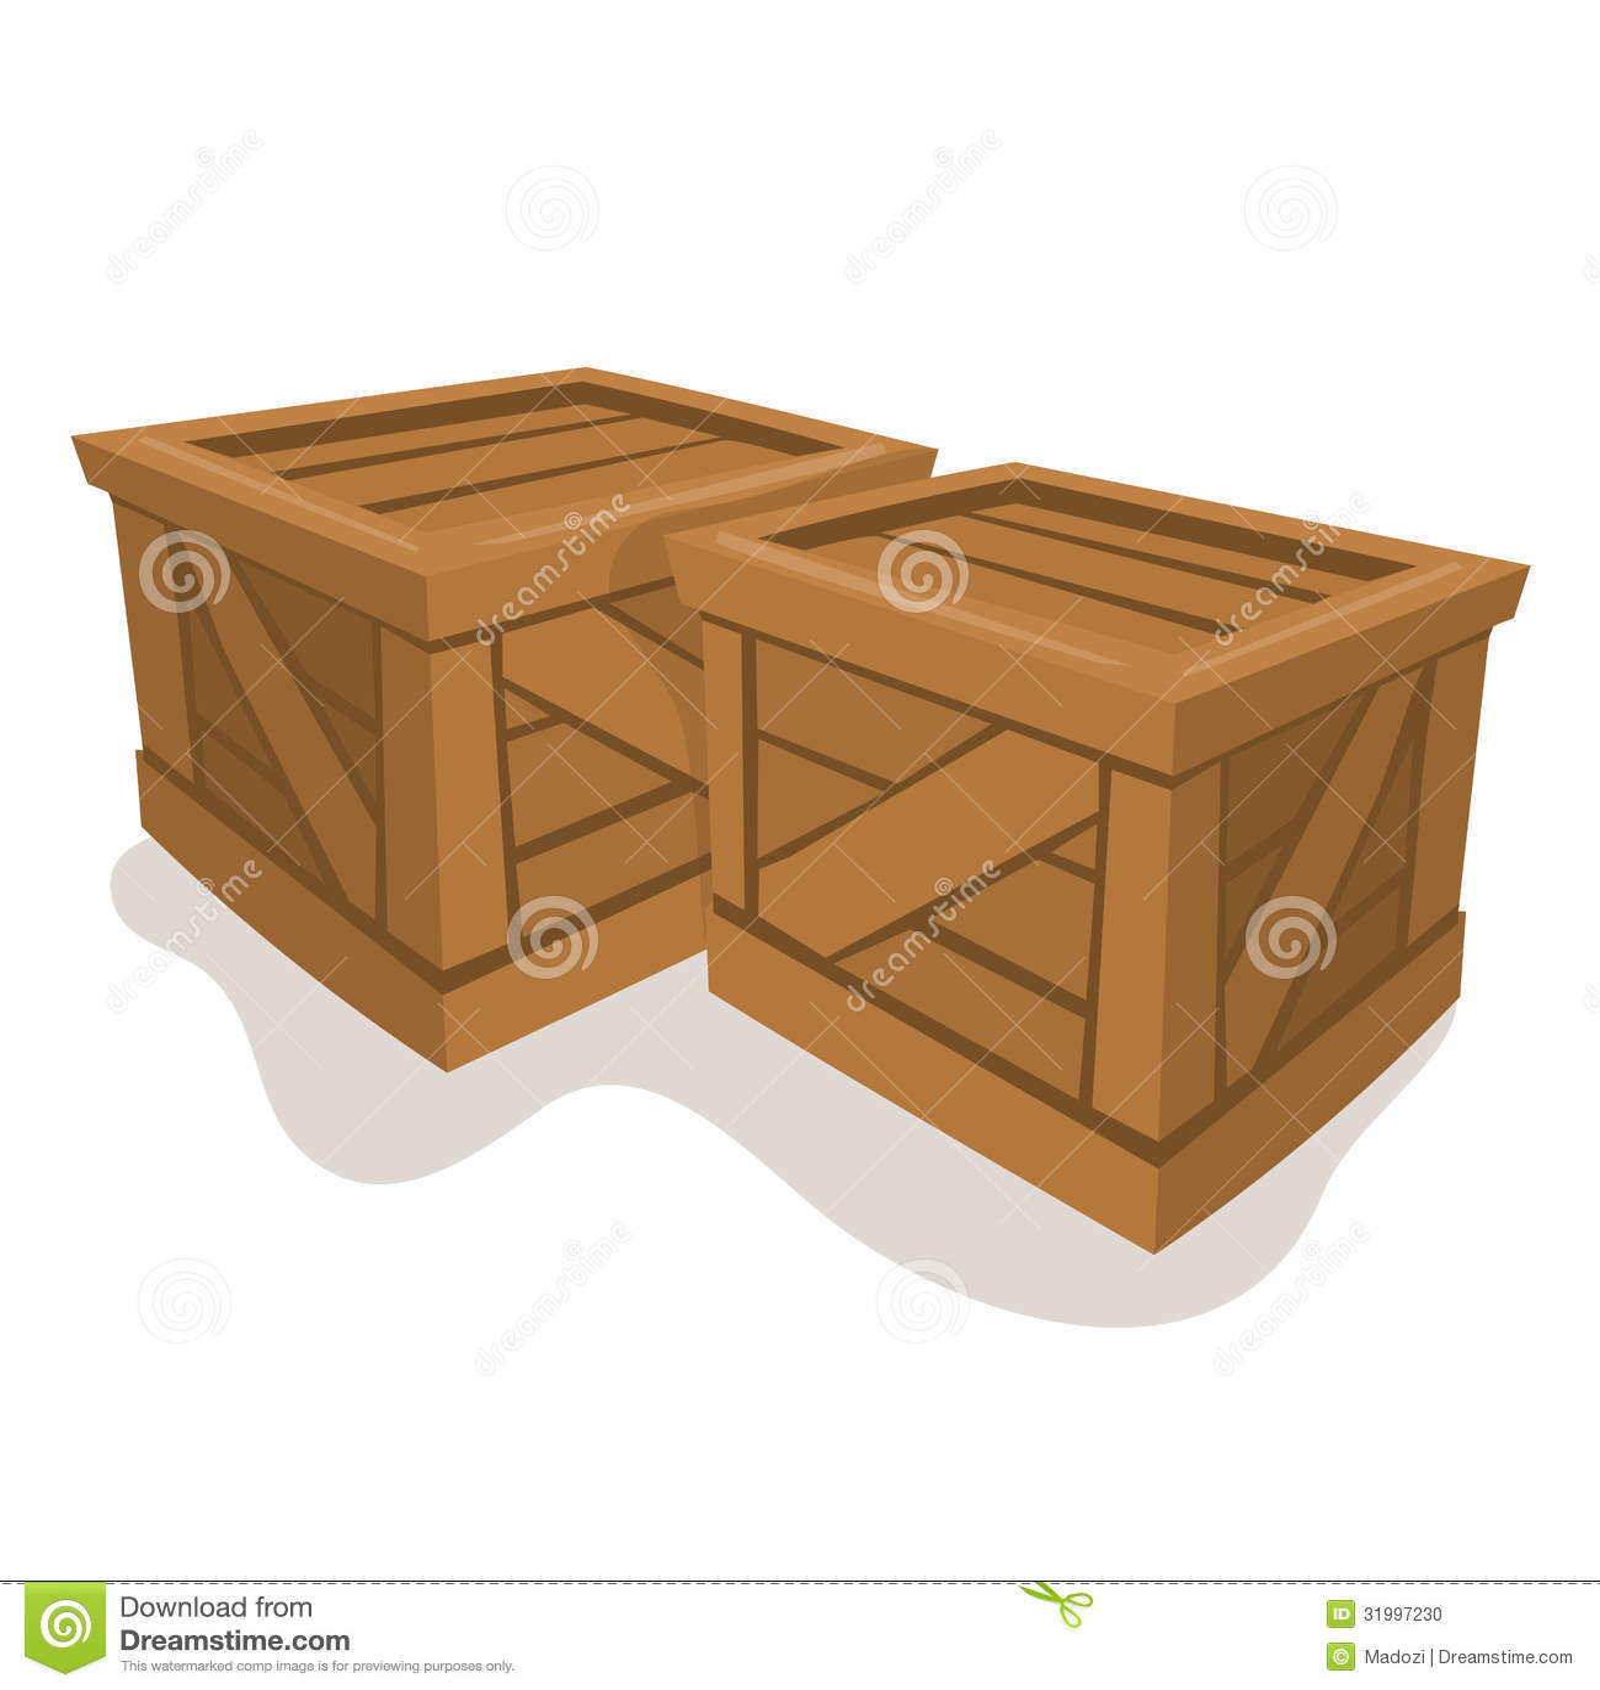 Wood Box Vector Illustration Stock Photo - Image: 31997230